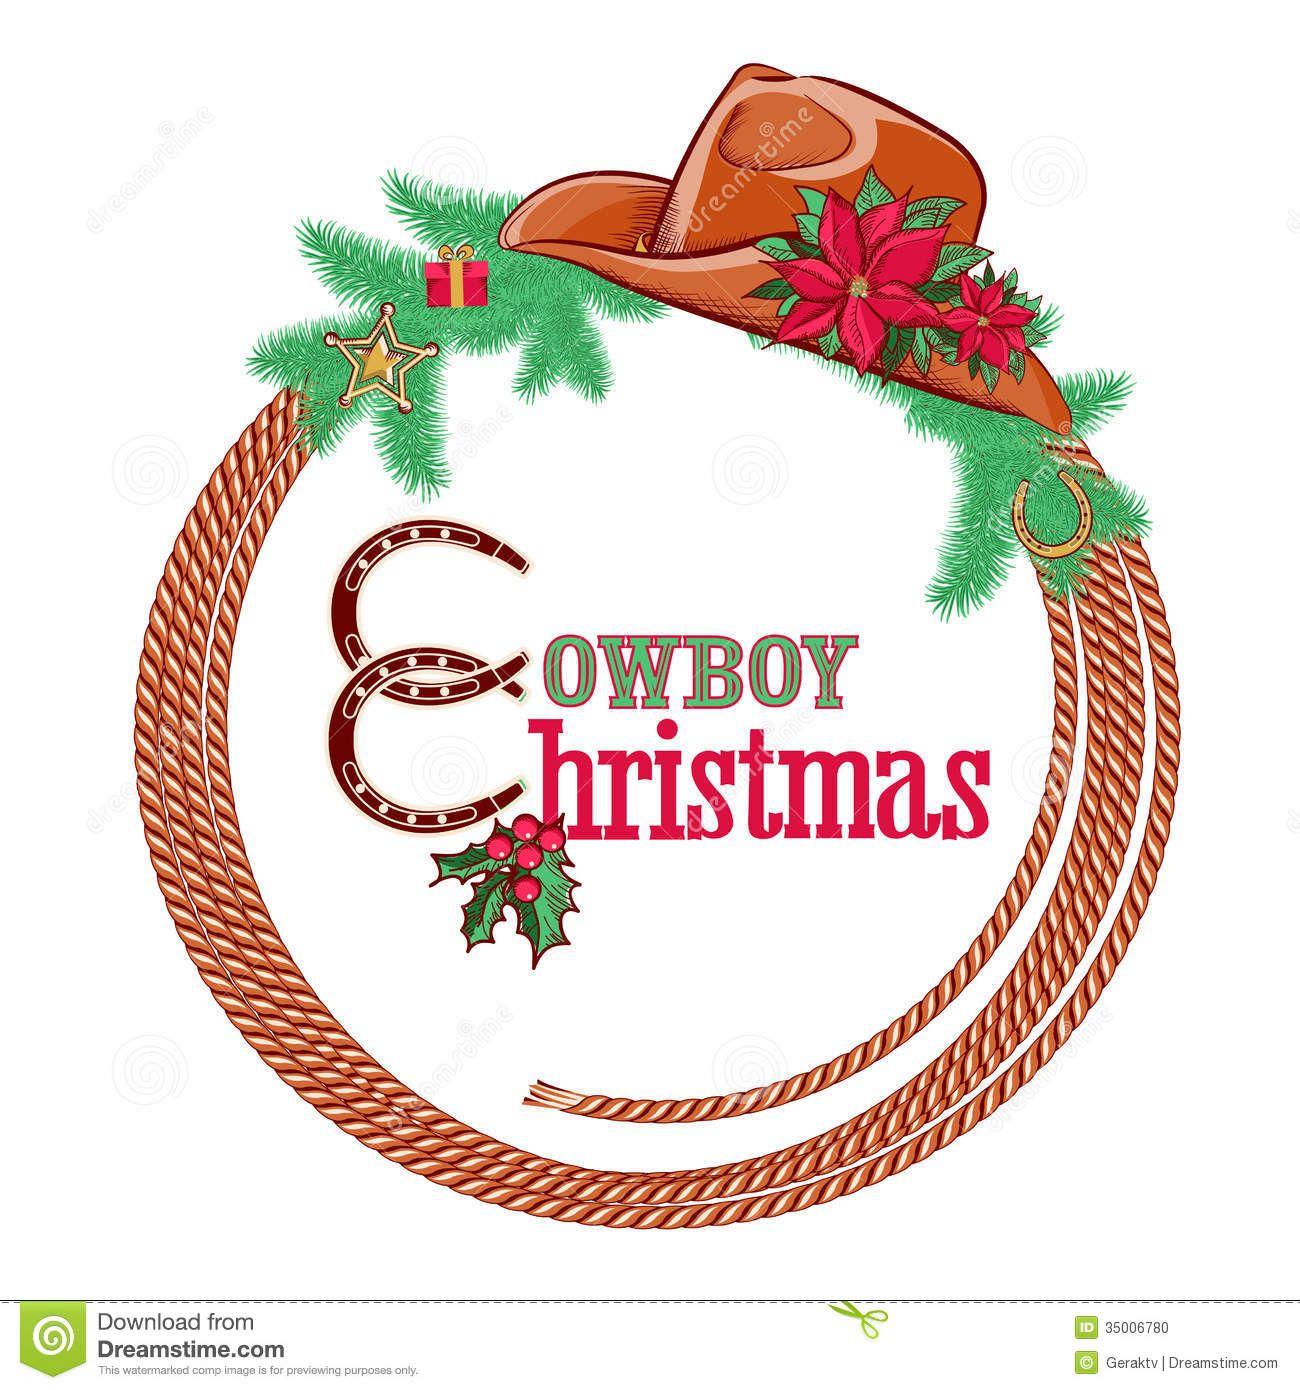 Cowboy christmas clipart free